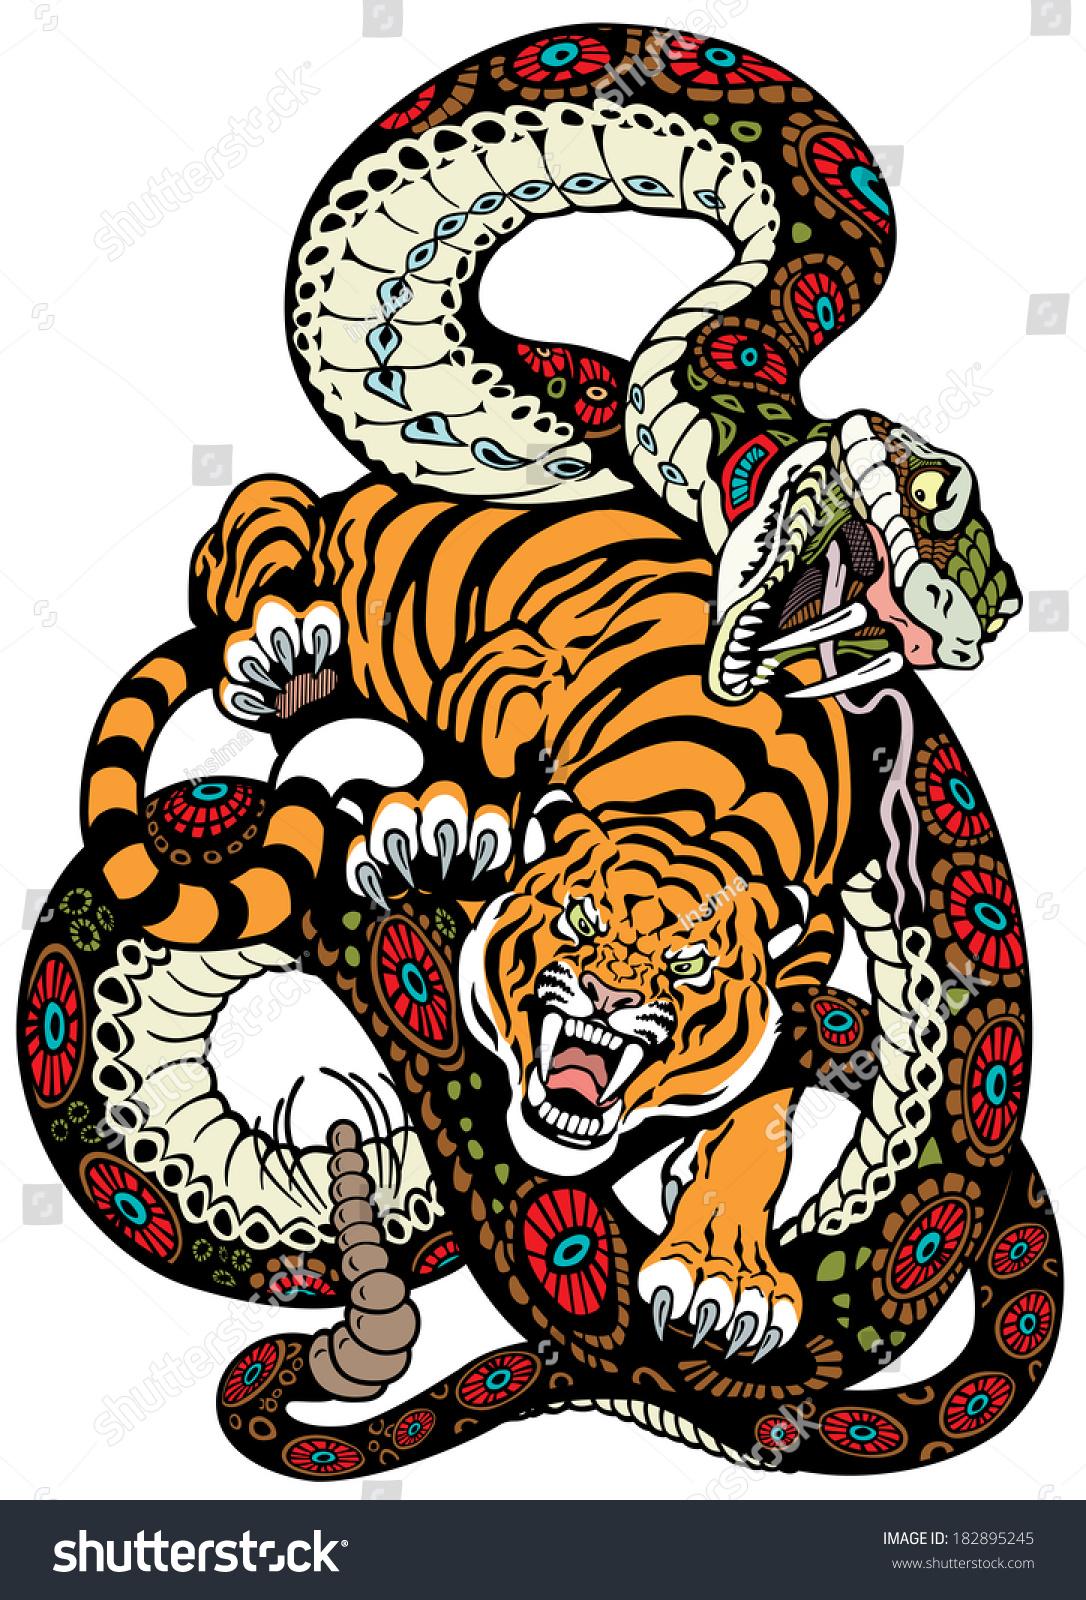 snake tiger fighting tattoo illustration stock vector 182895245 shutterstock. Black Bedroom Furniture Sets. Home Design Ideas